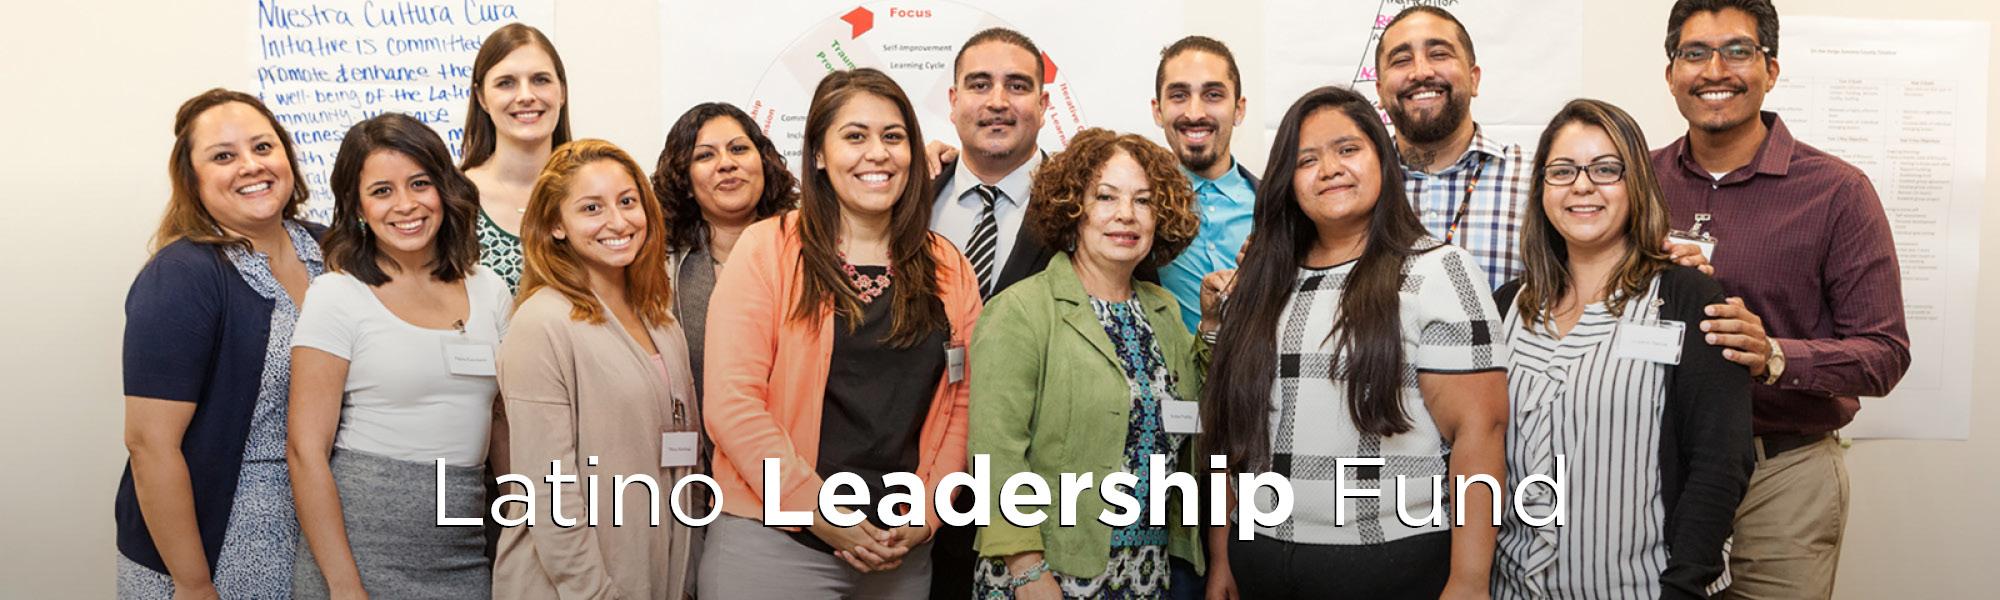 Latino Leadership Fund